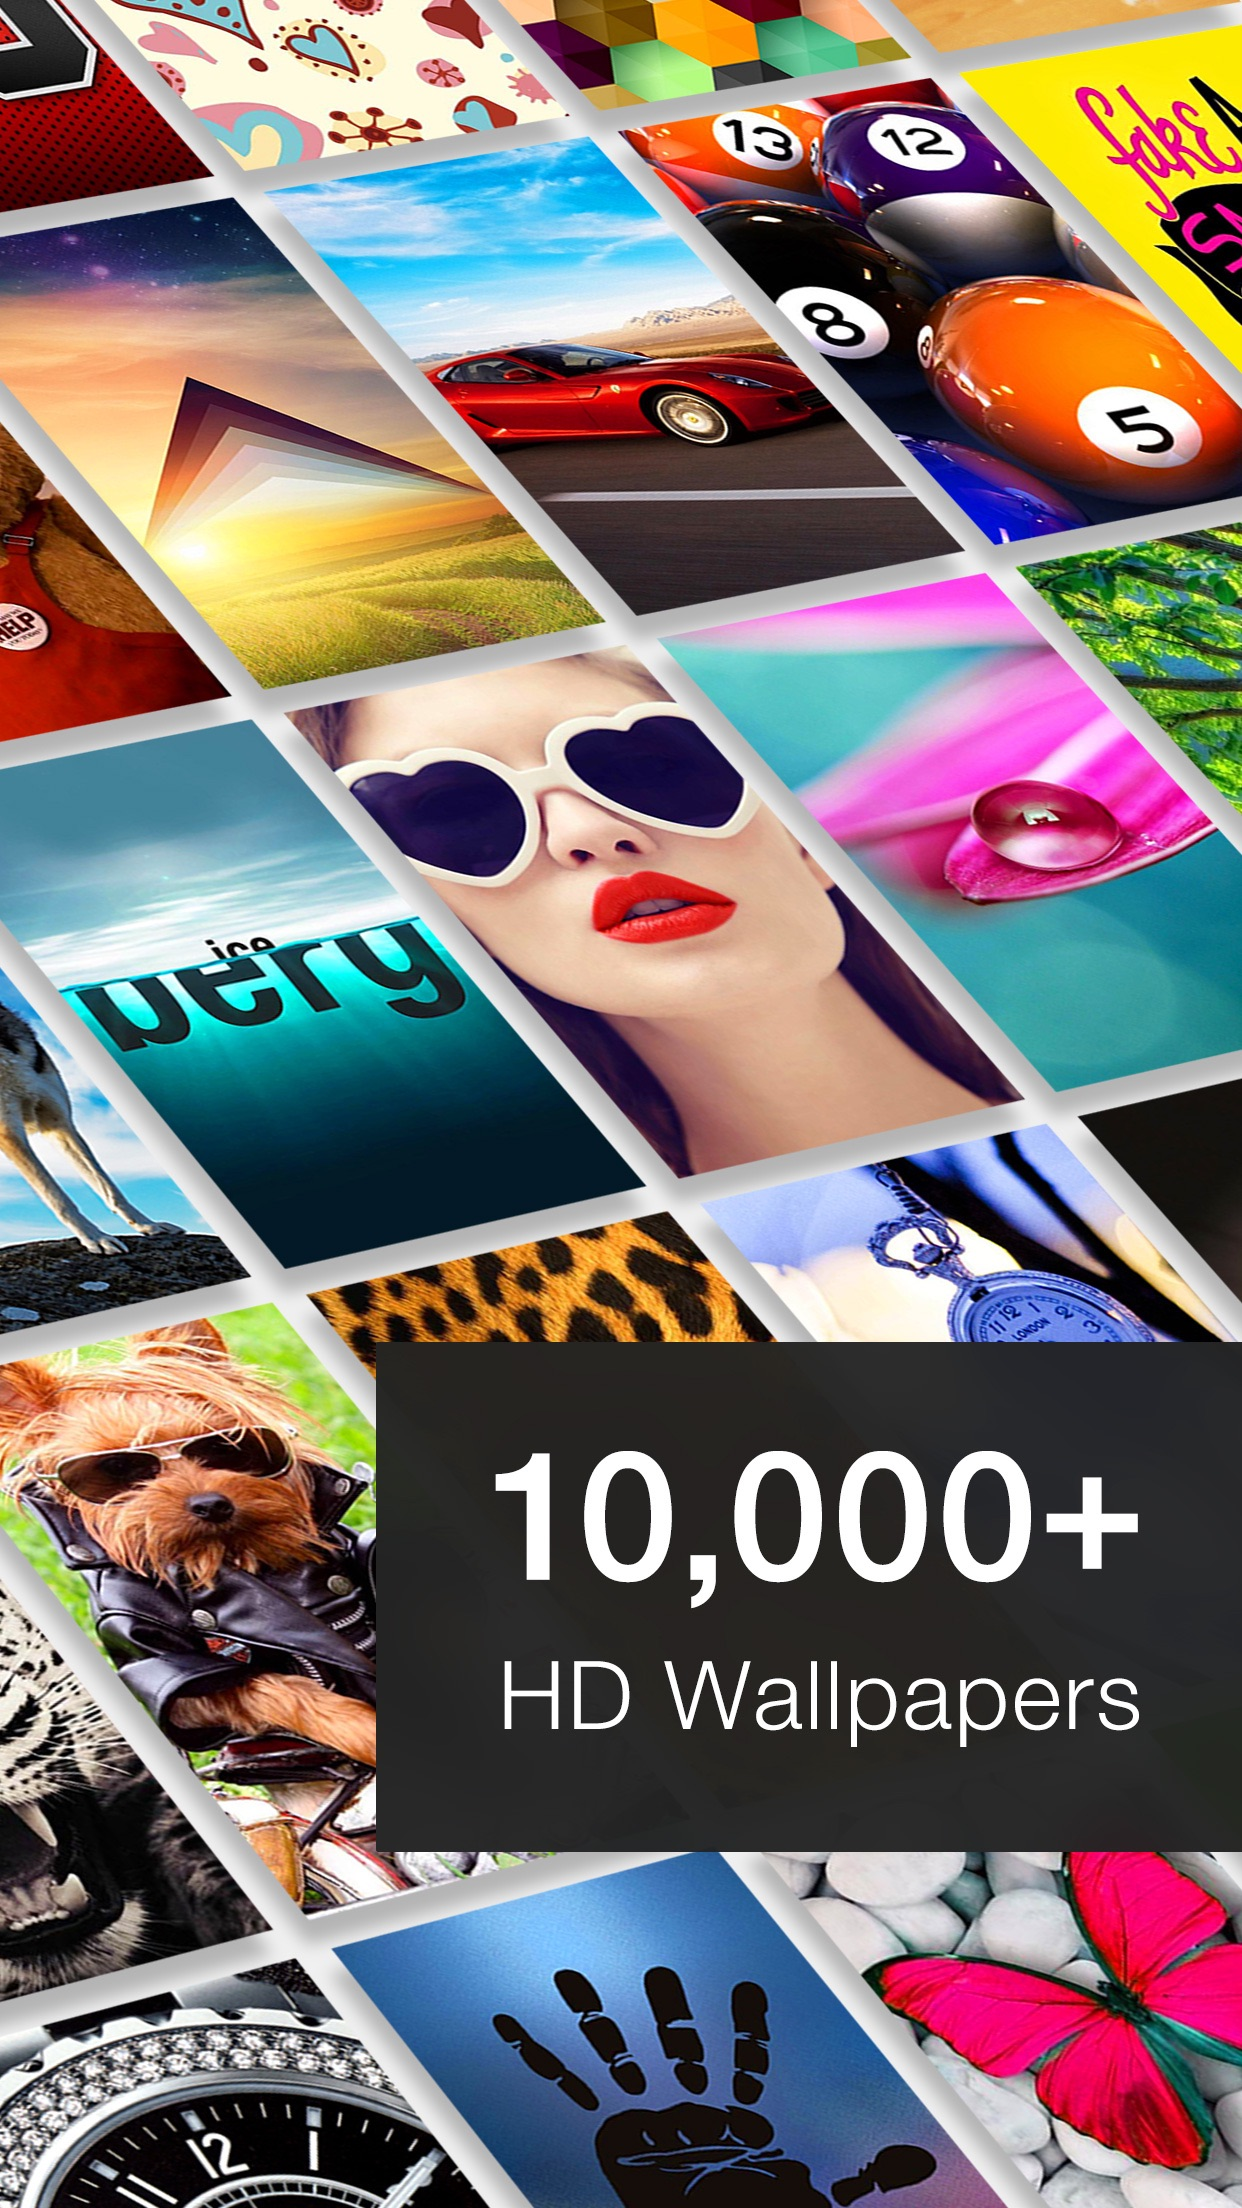 Wallpapers & Backgrounds by 10000+ Wallpaper HD Screenshot